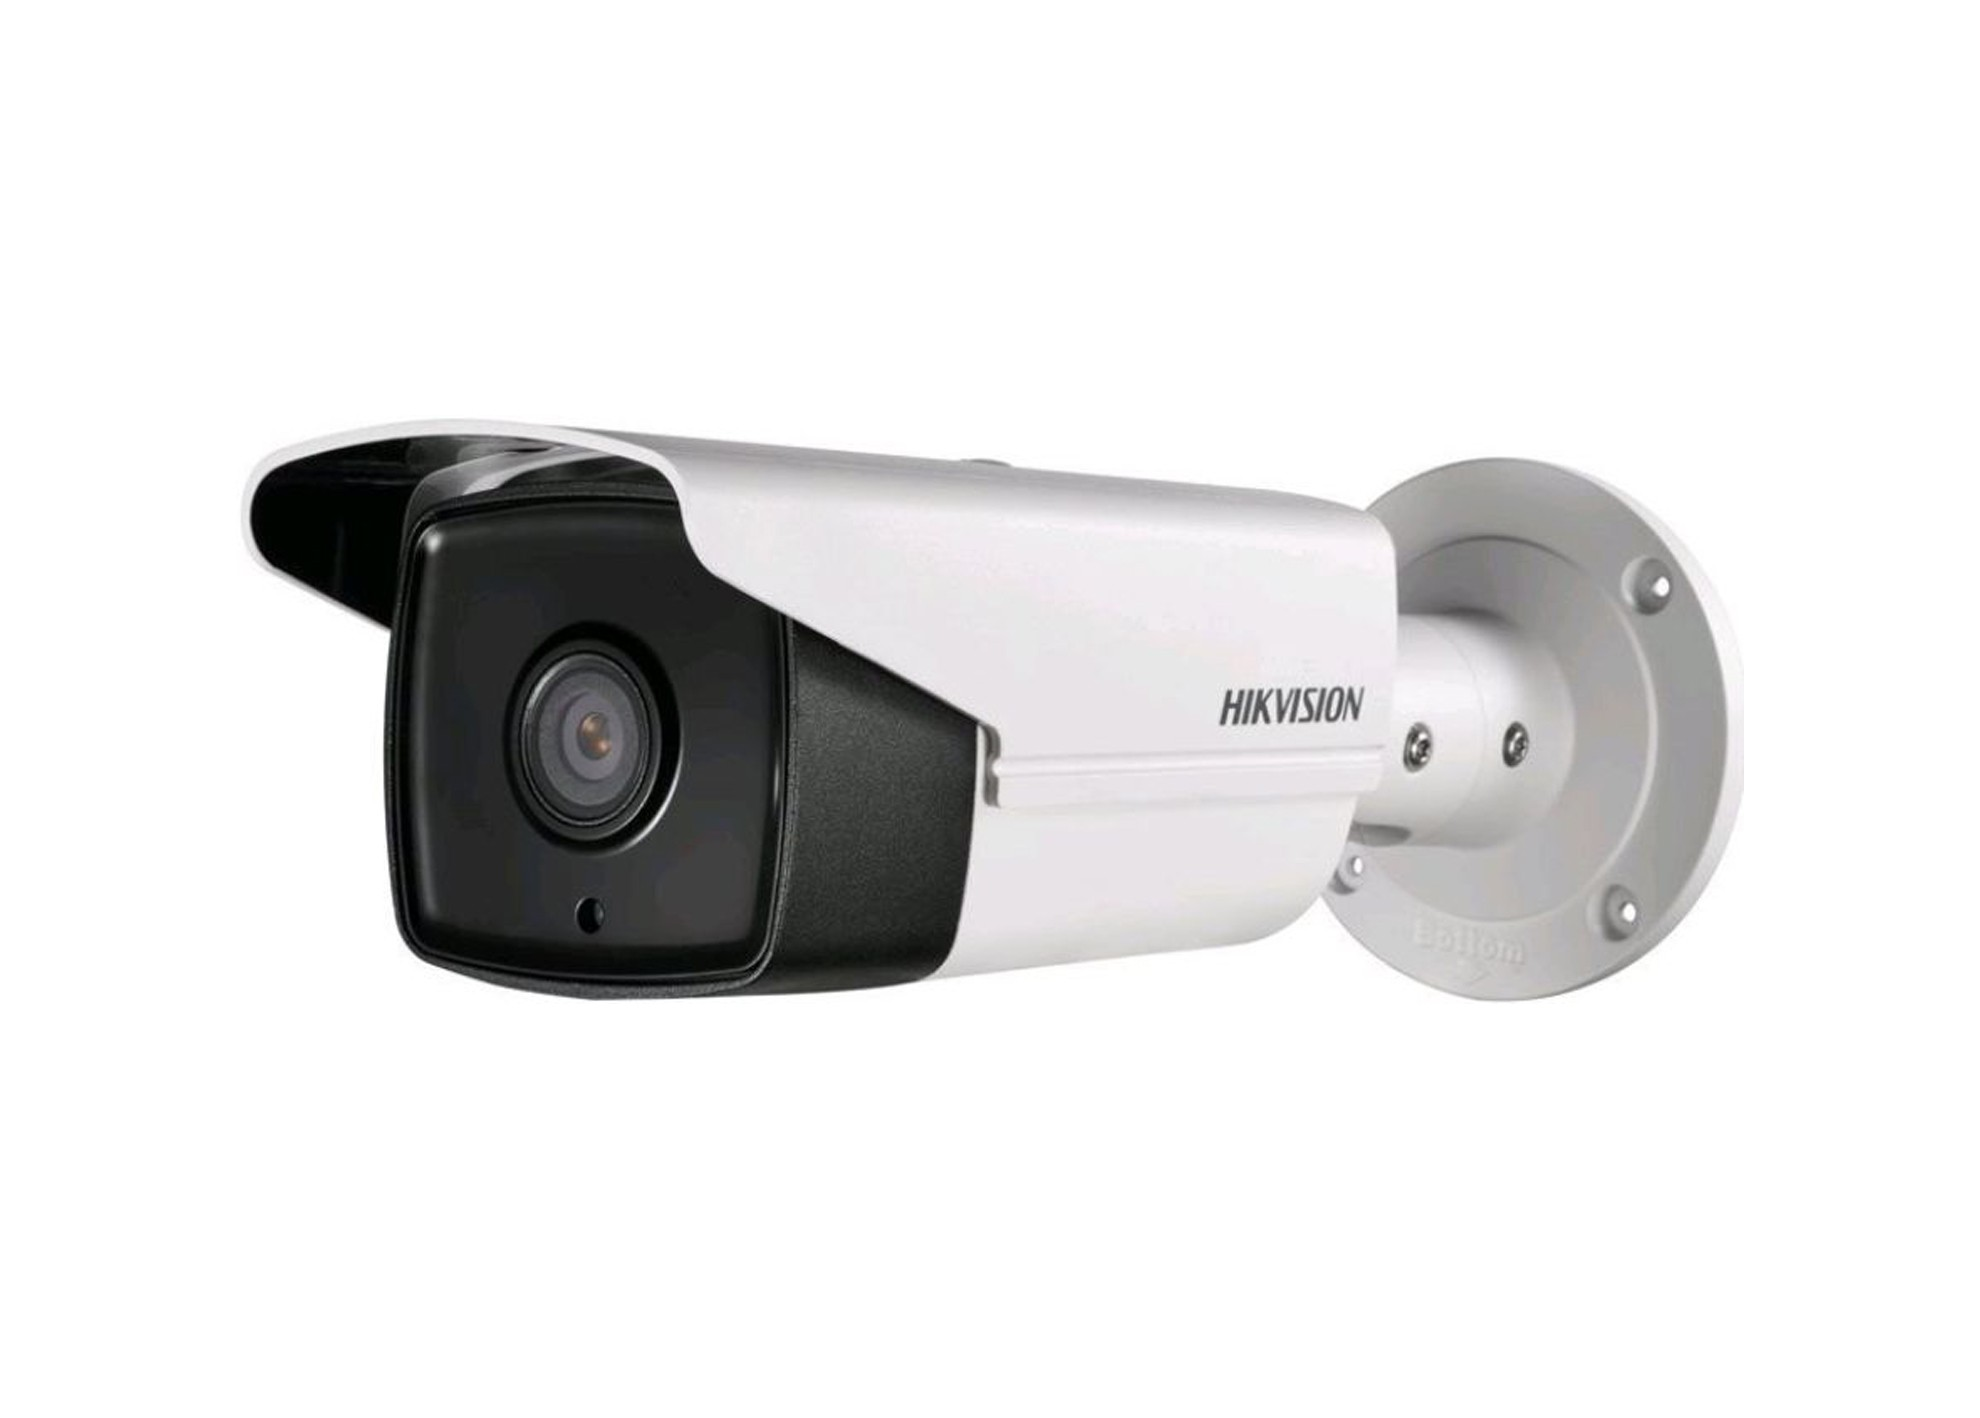 Kamera DS-2CD2T45FWD-I8 (4mm) rč.013D